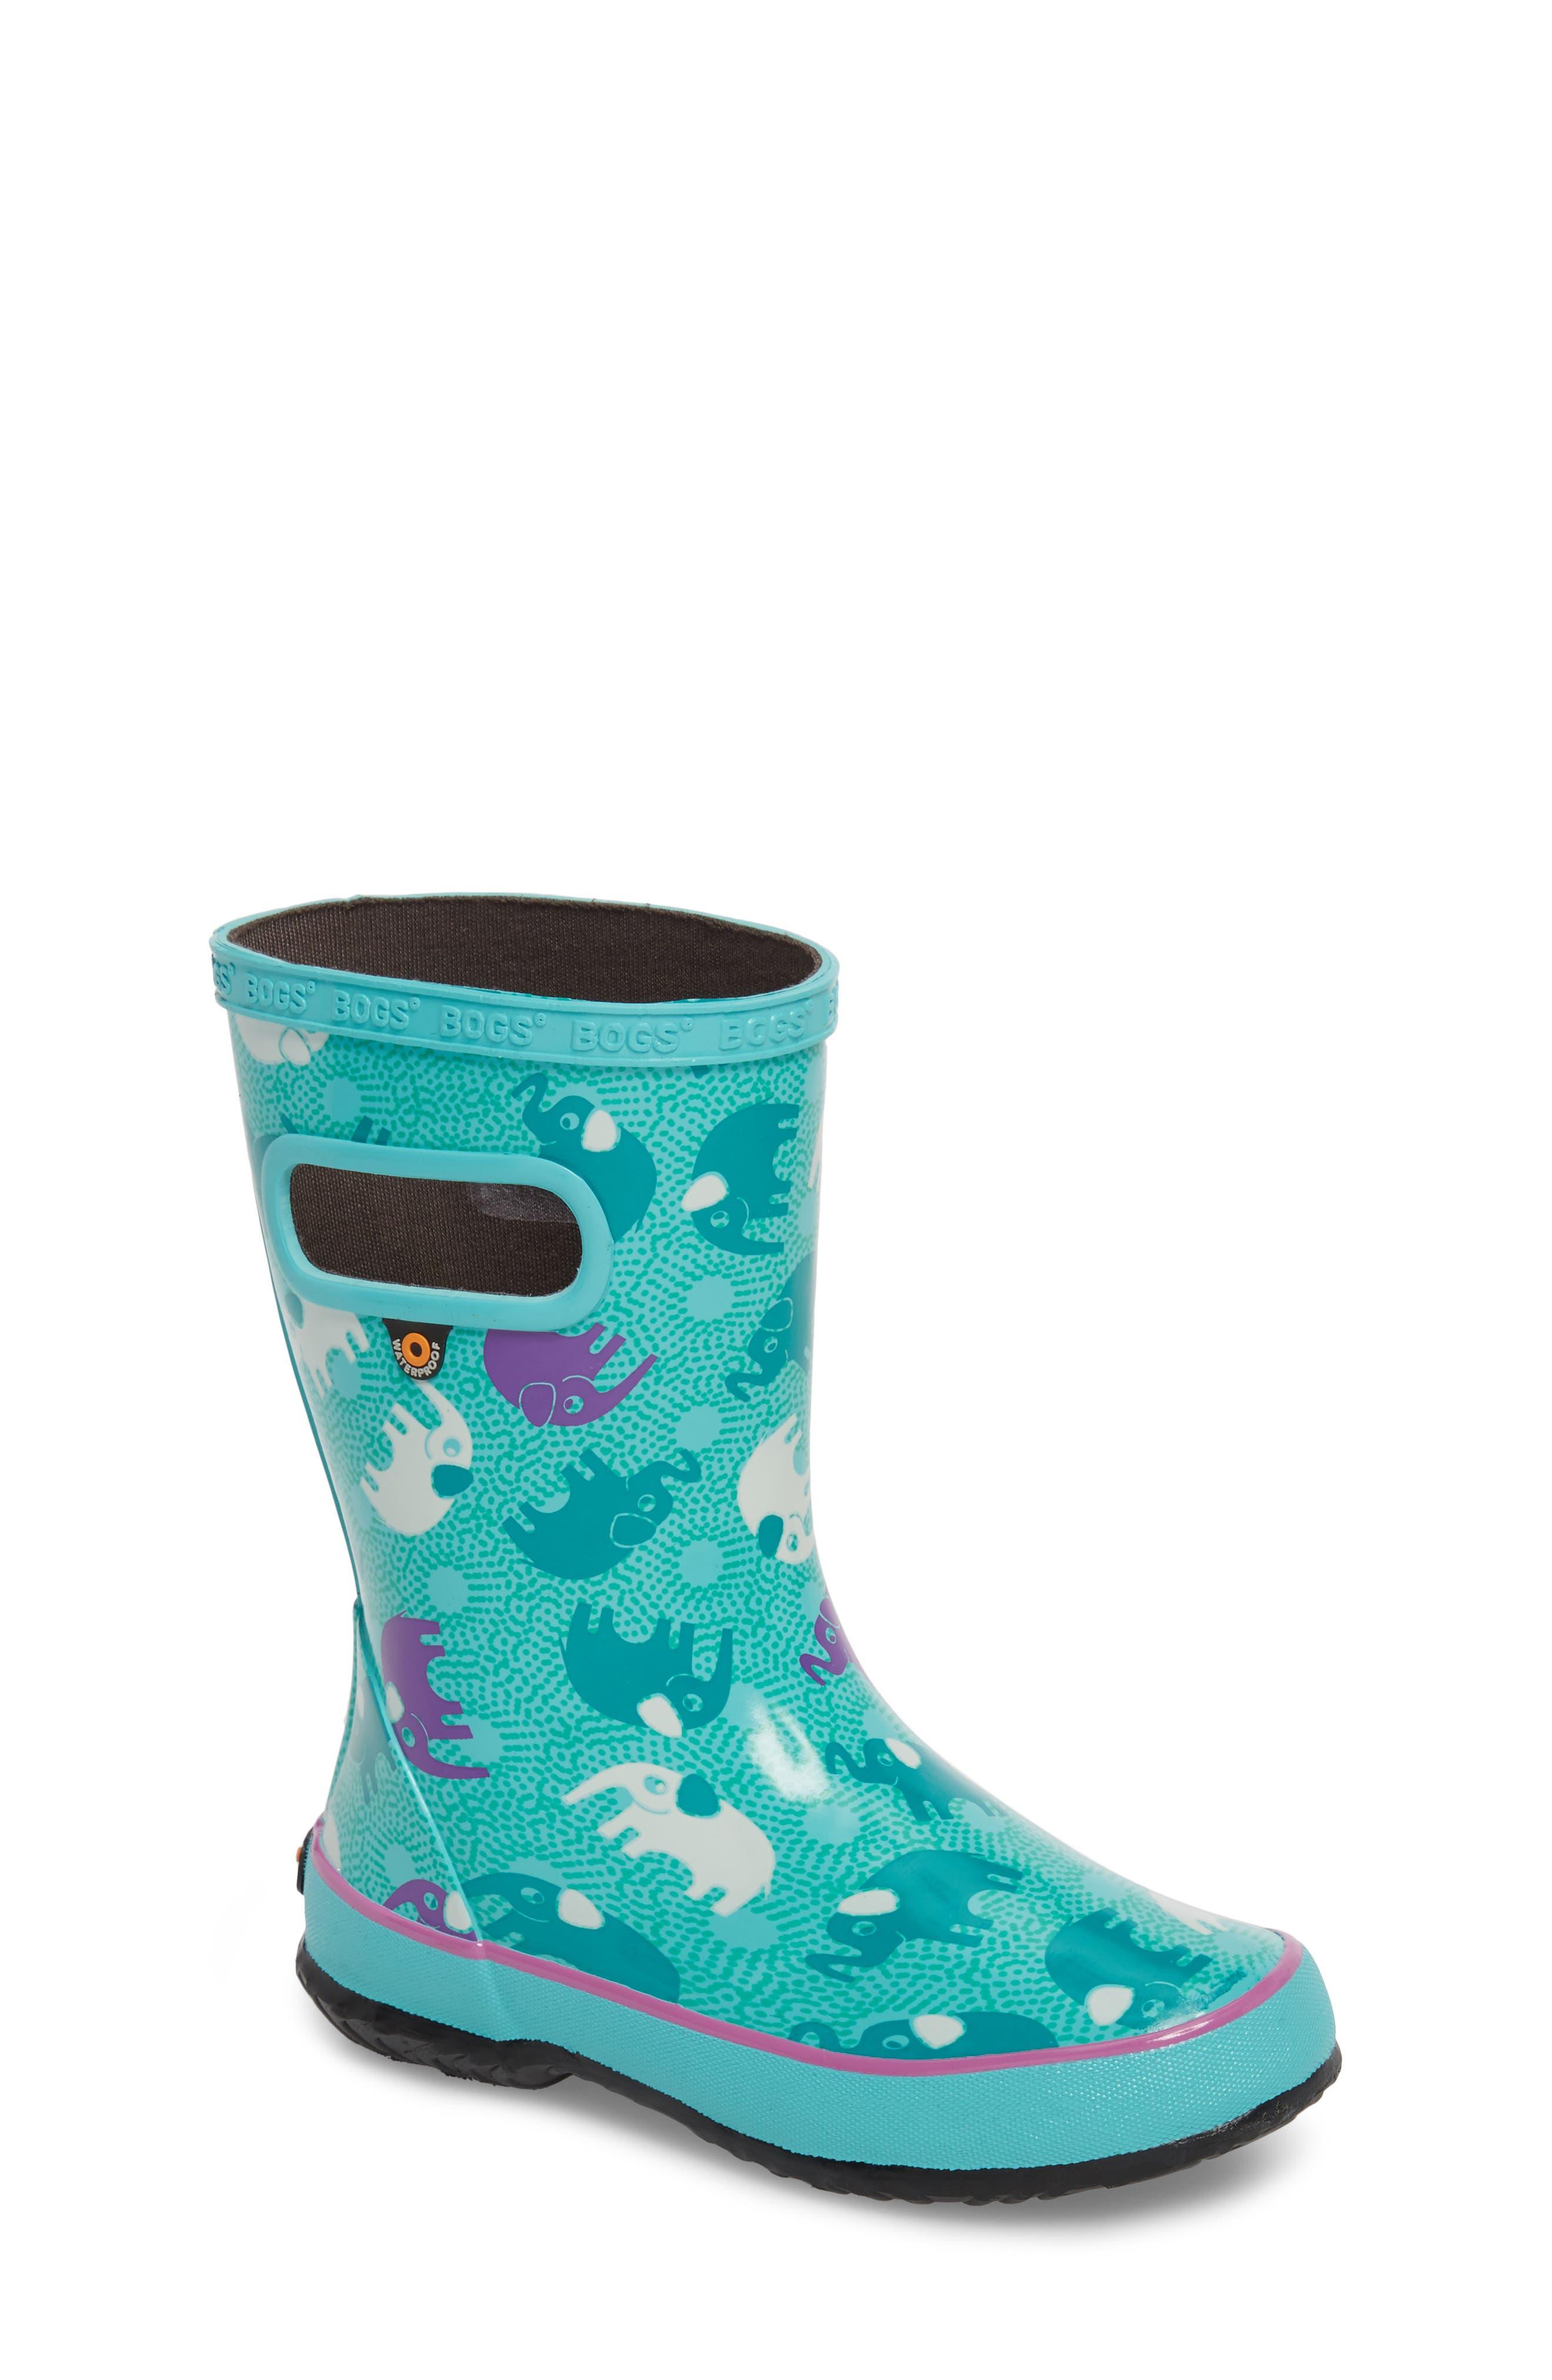 Bogs Skipper Elephant Print Rubber Rain Boot (Baby, Walker, Toddler & Little Kid)